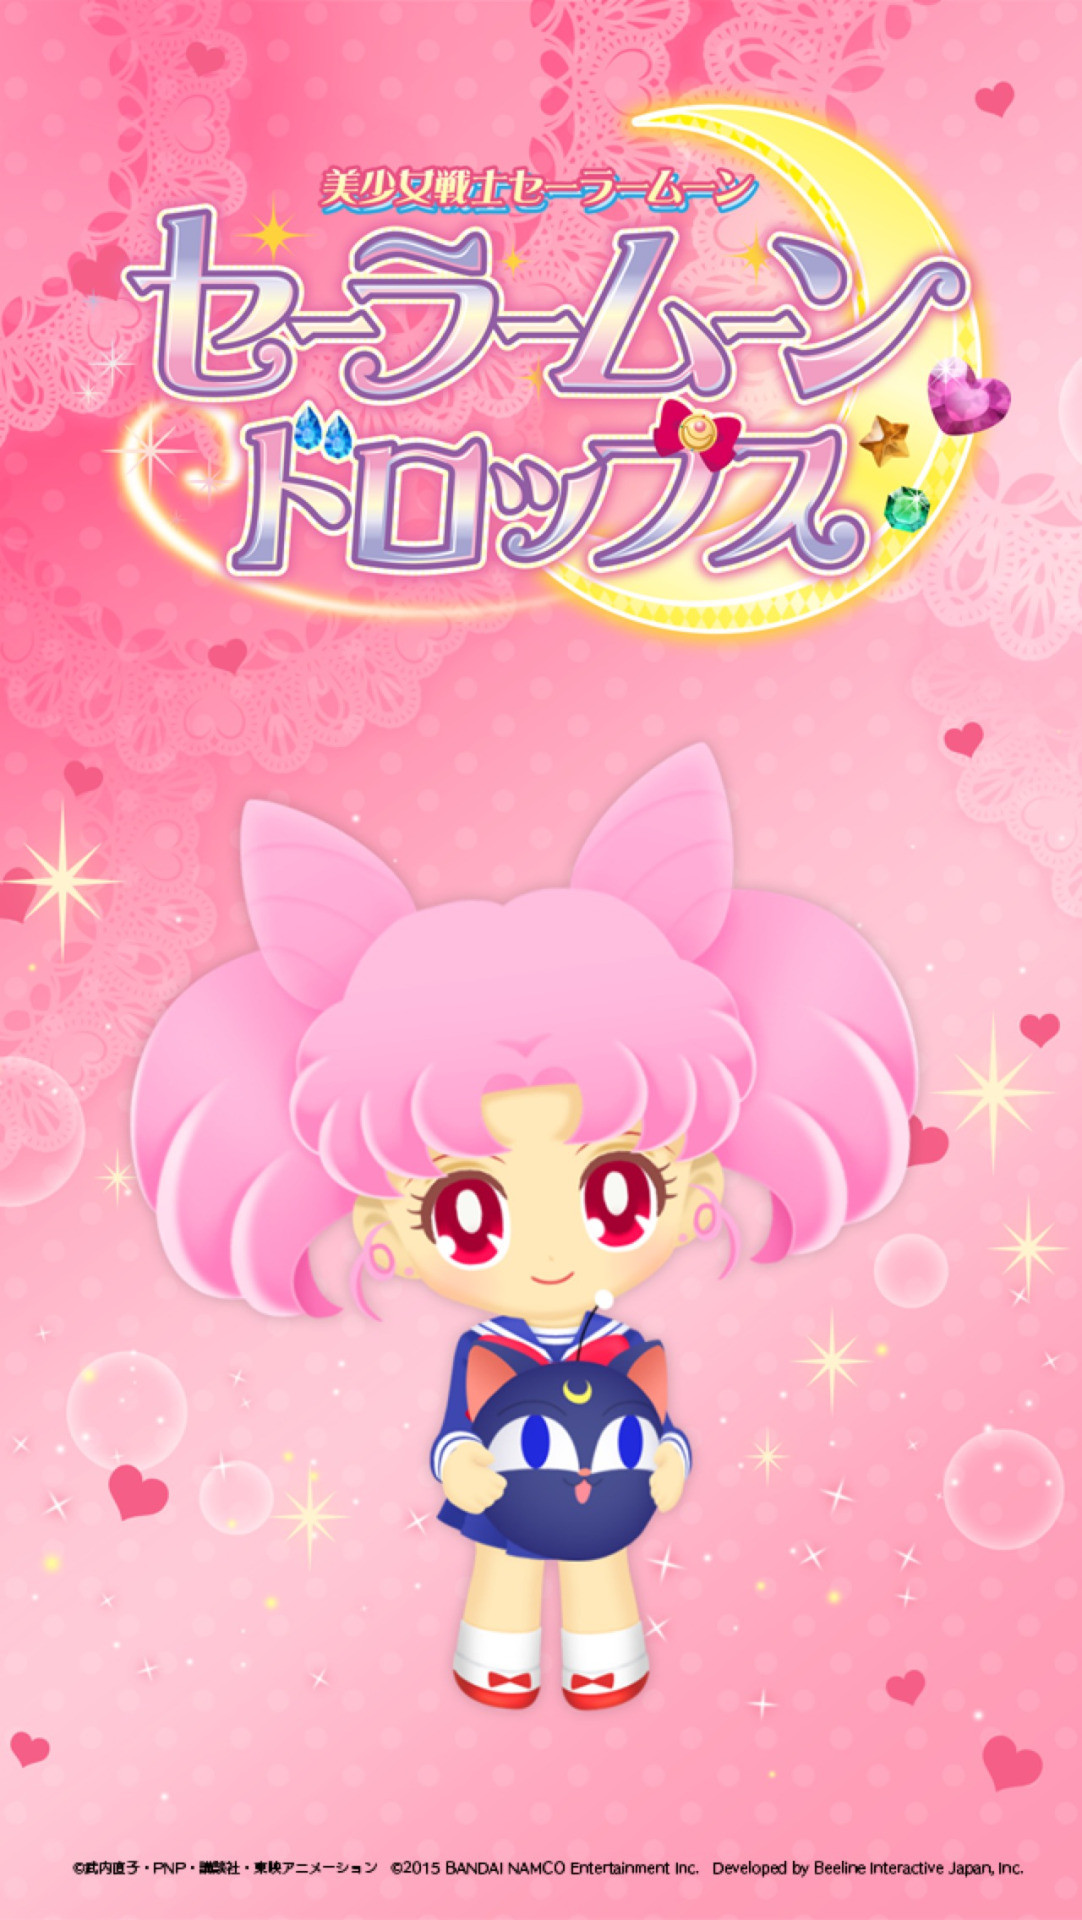 Sailor moon character · tumblr_o3a3zh5T5H1ub0sqao8_1280.jpg (1082×1920)